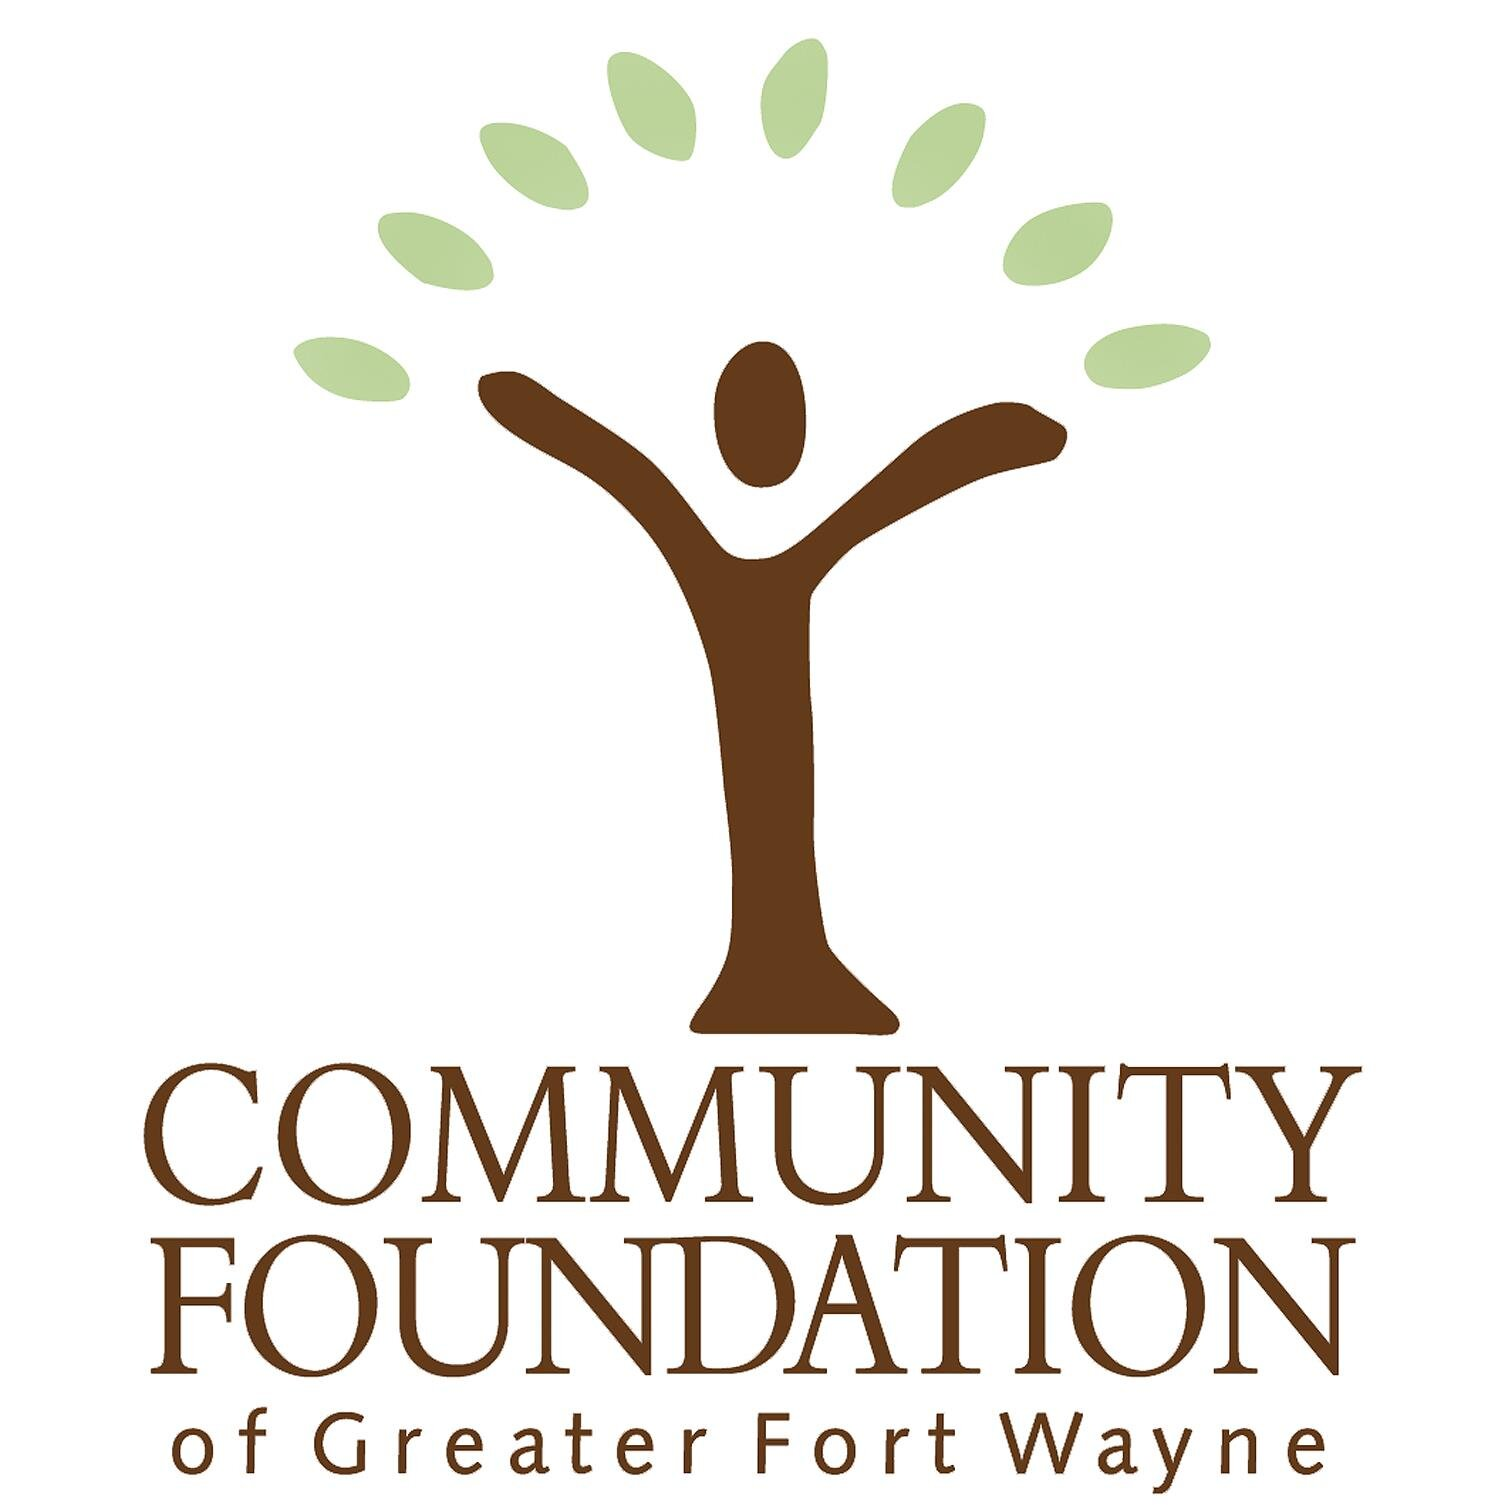 Community Foundation of Greater Fort Wayne